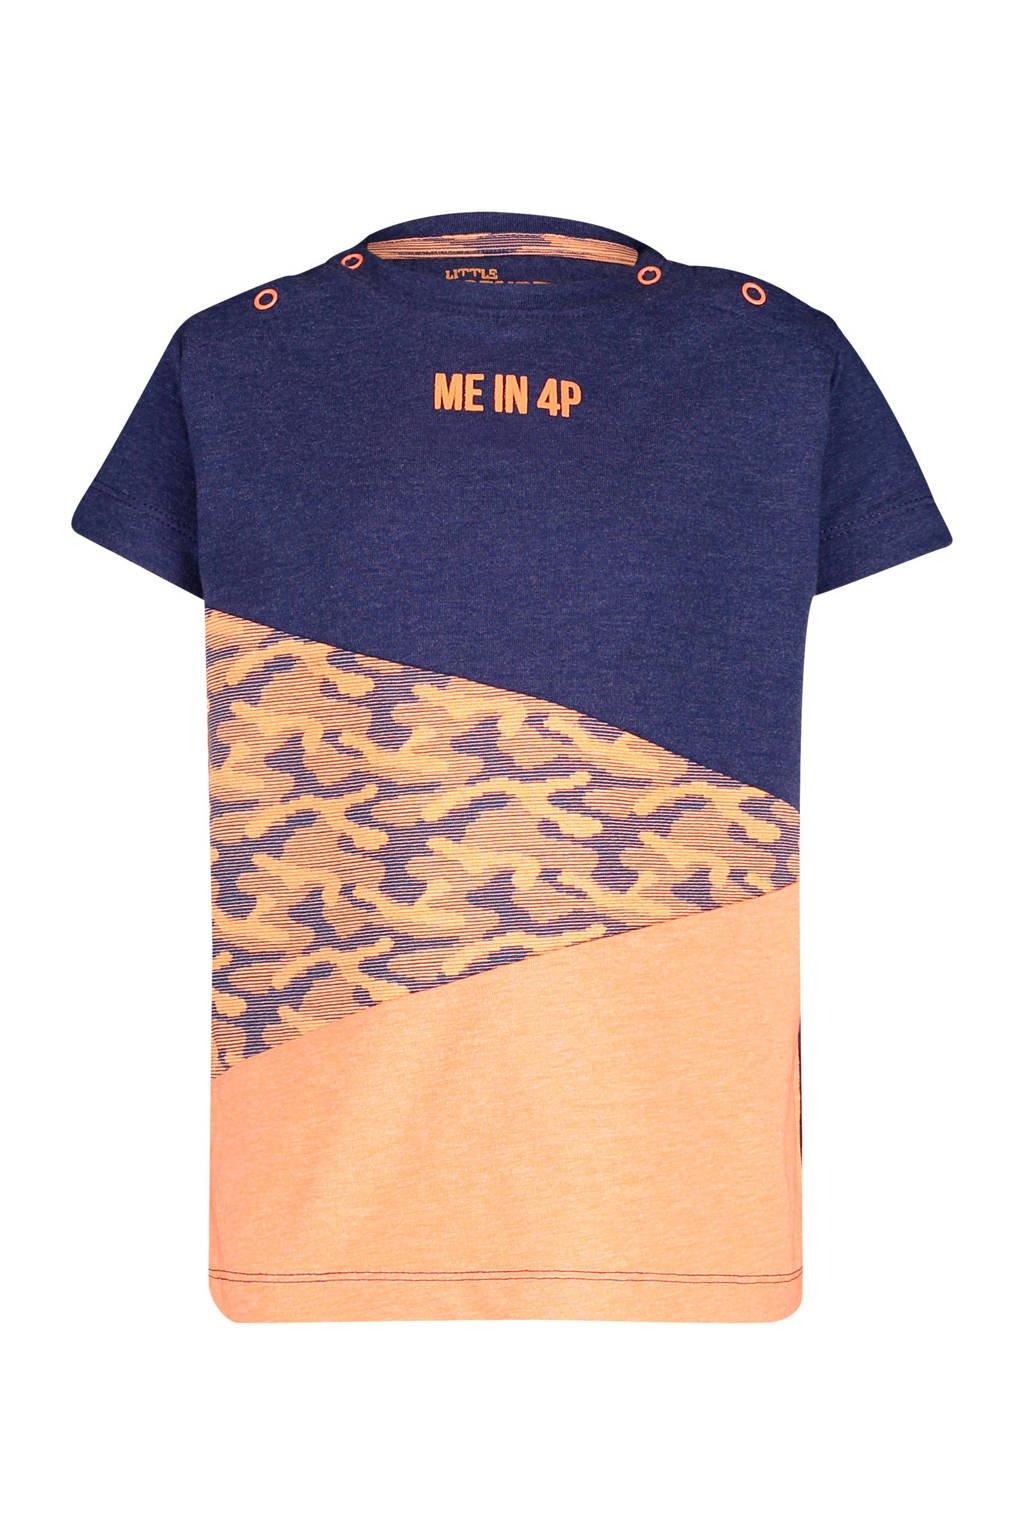 4PRESIDENT T-shirt Augustin neon oranje/donkerblauw